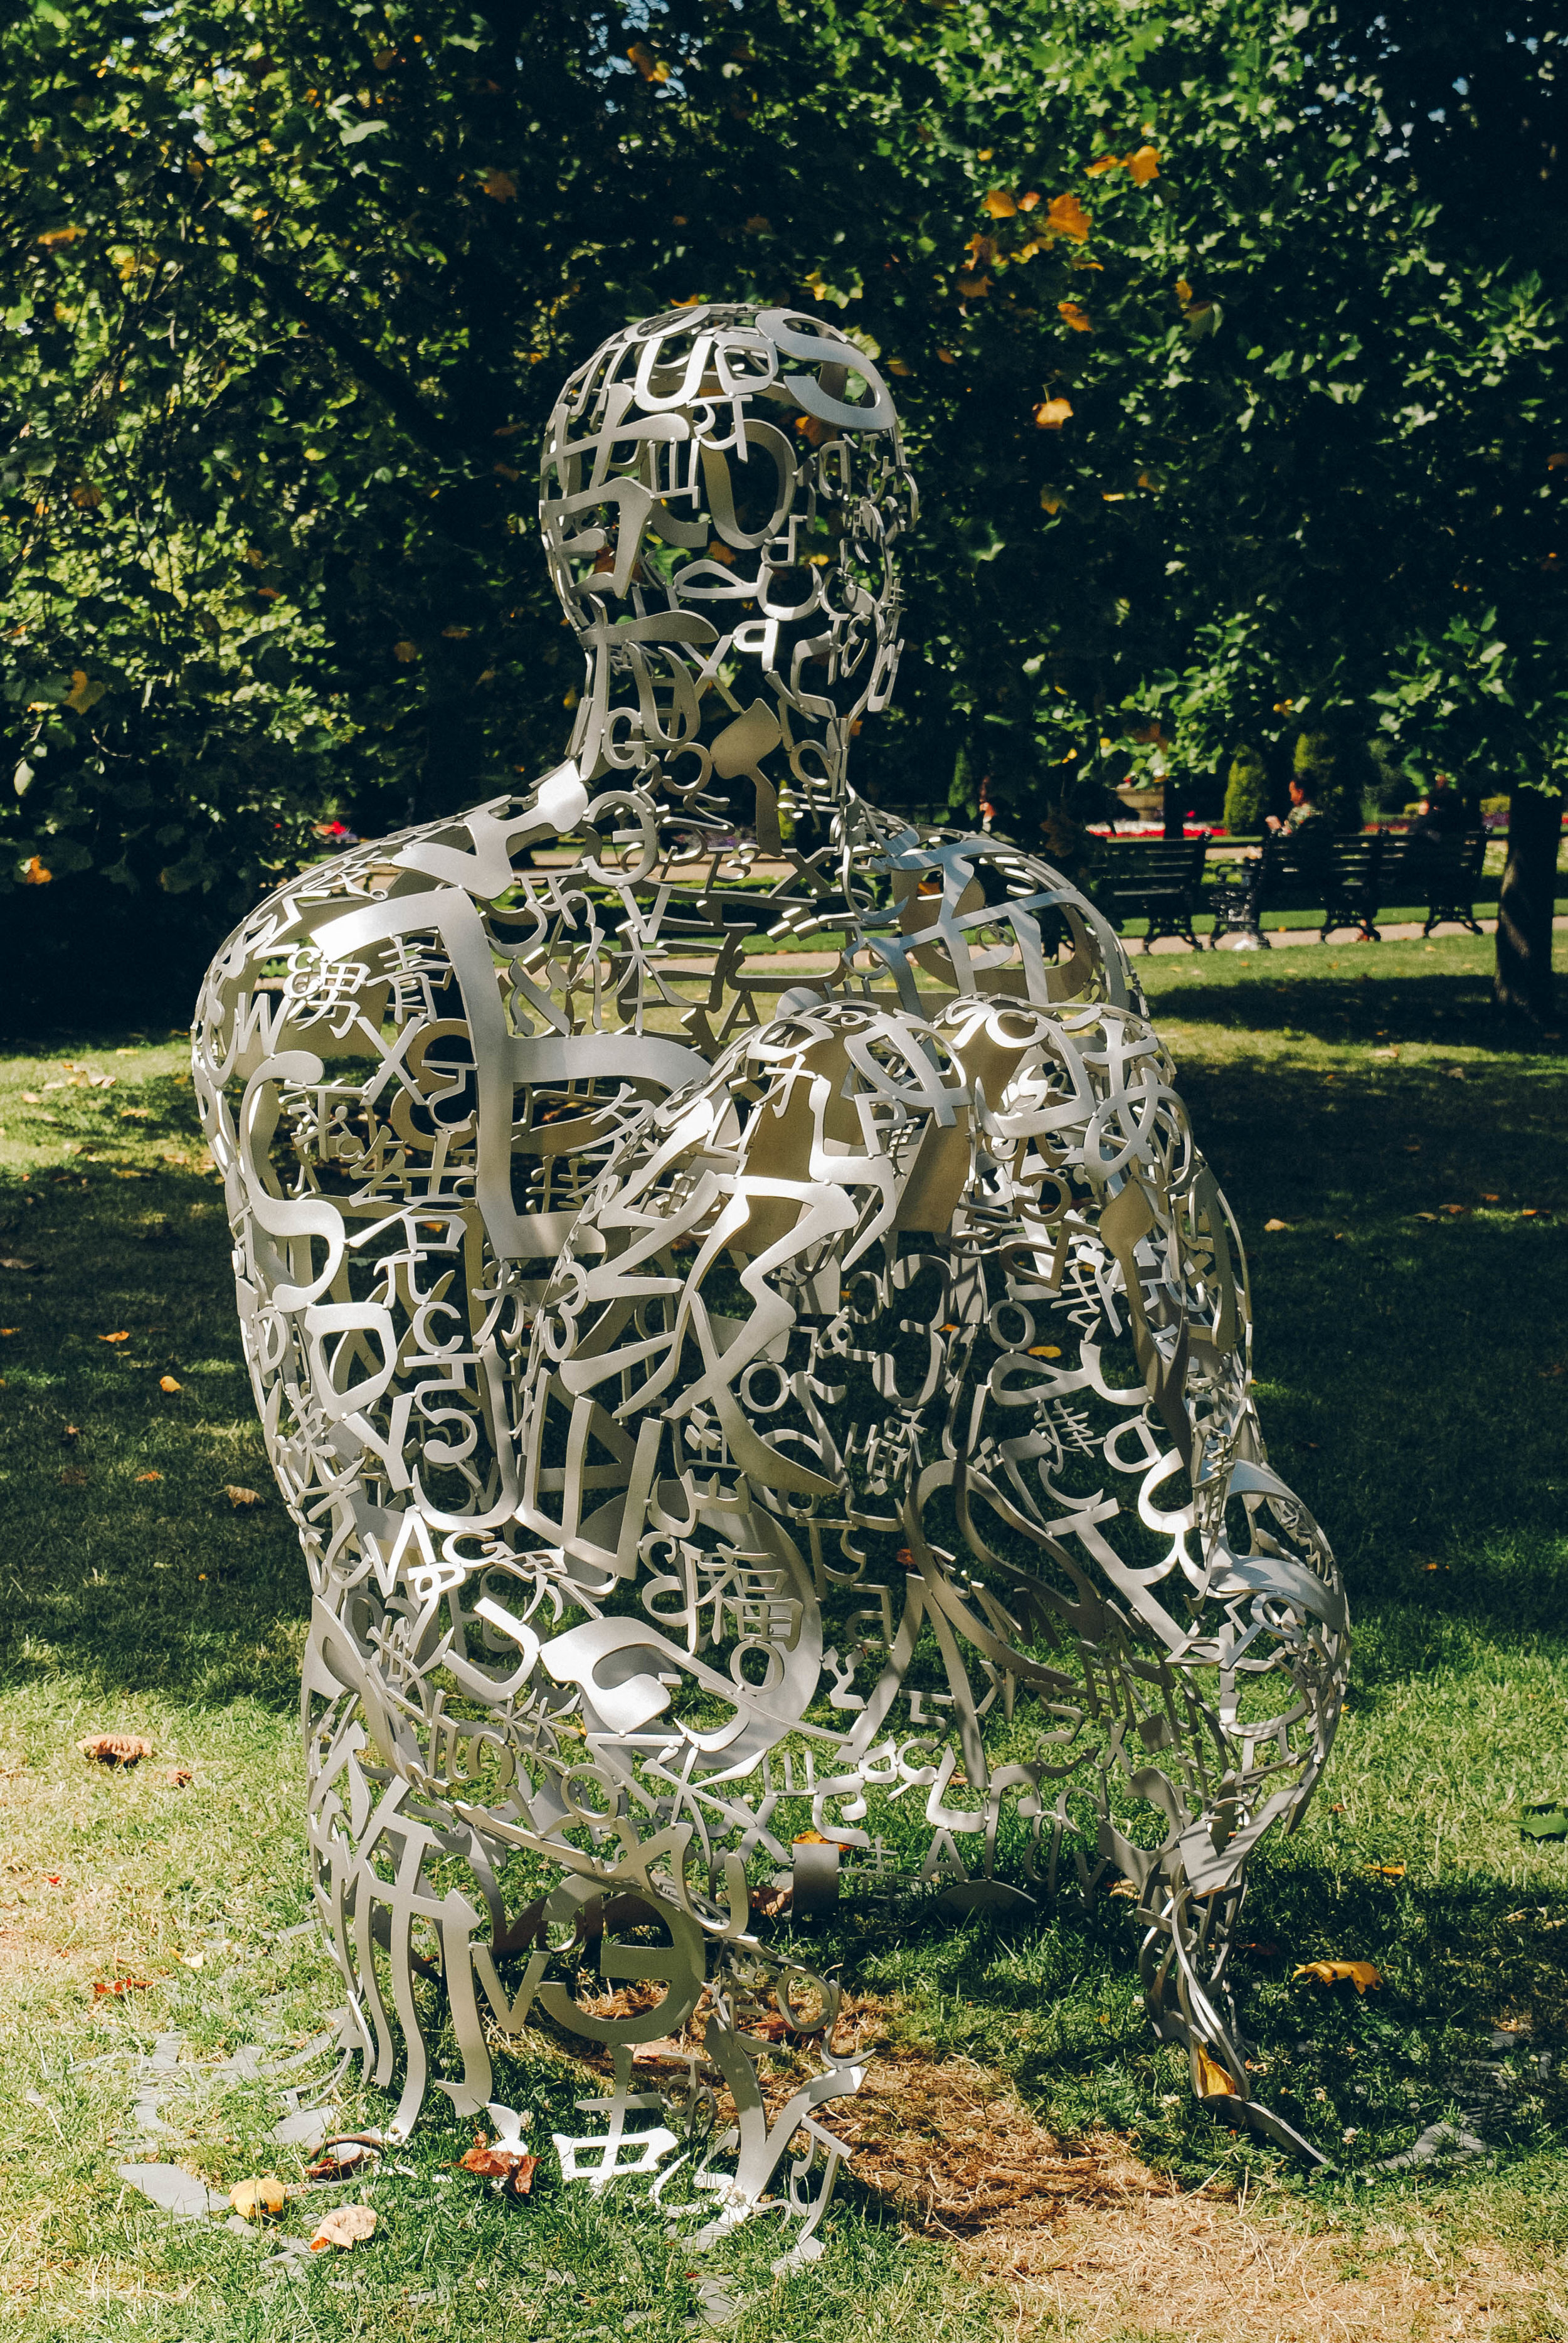 frieze sculpture regents park (14 of 15).jpg